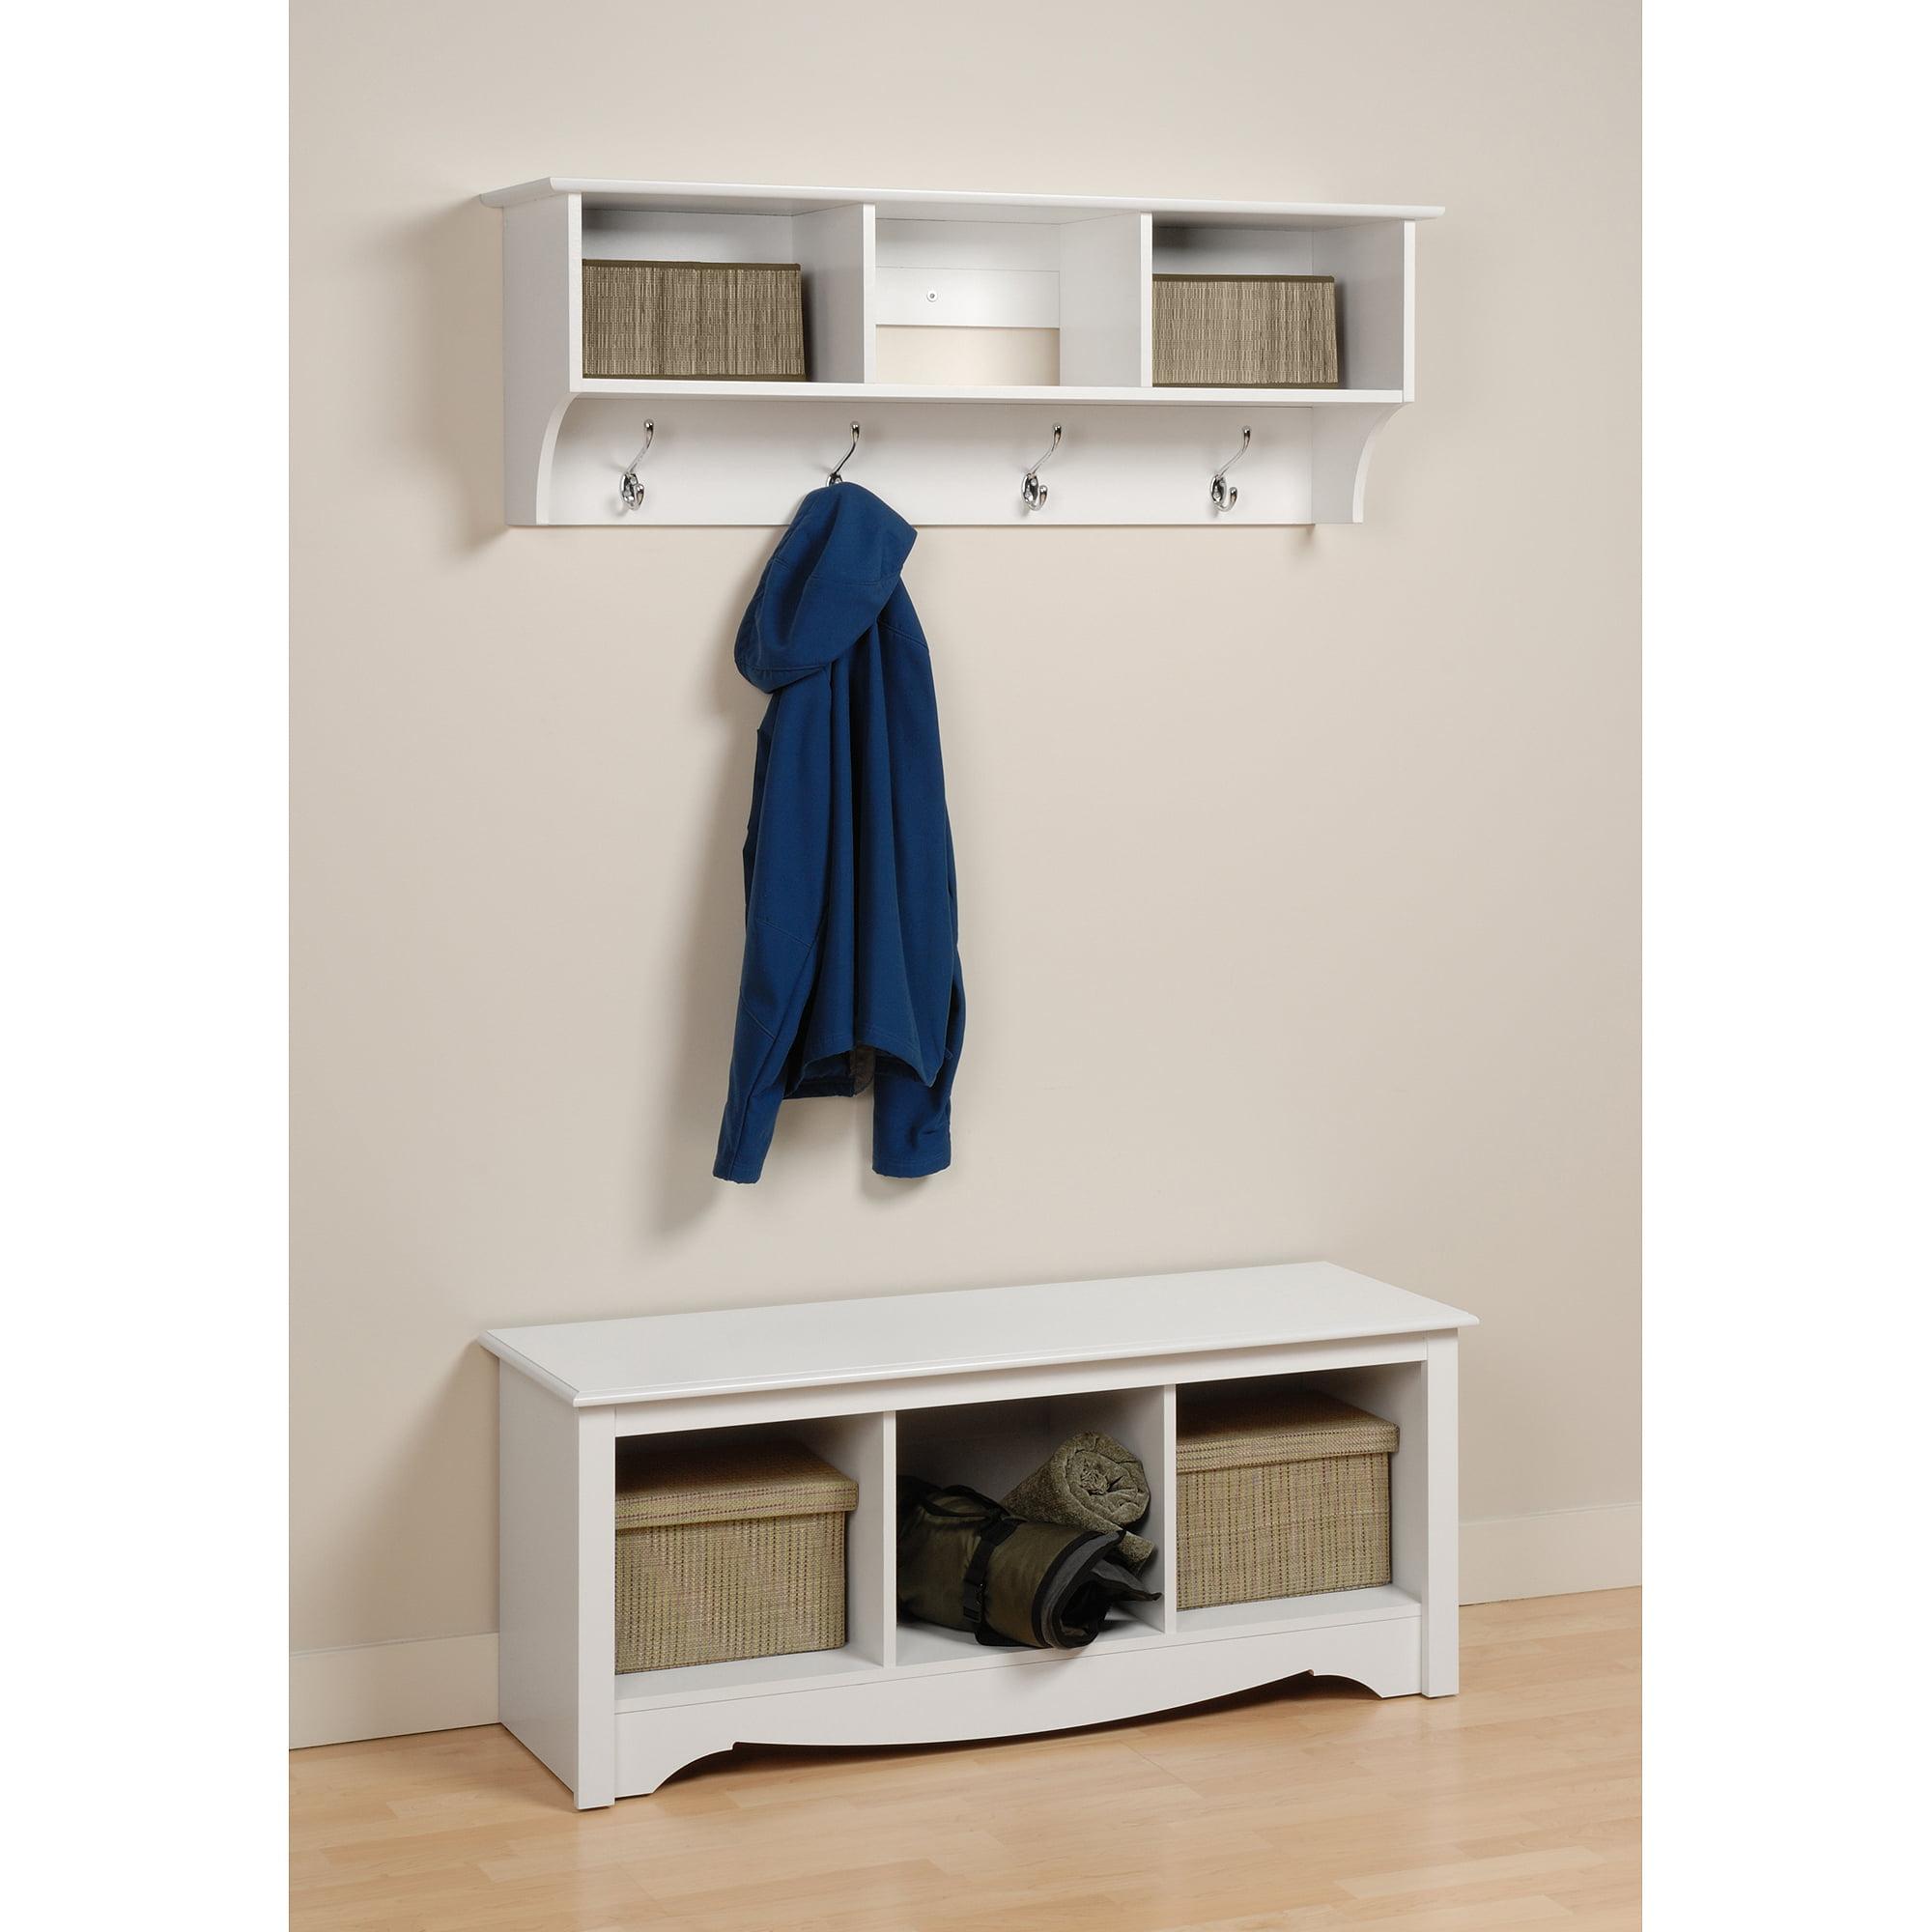 design decor creative room picture decorative interior hangers decors house remodel joist under planning view ideas a